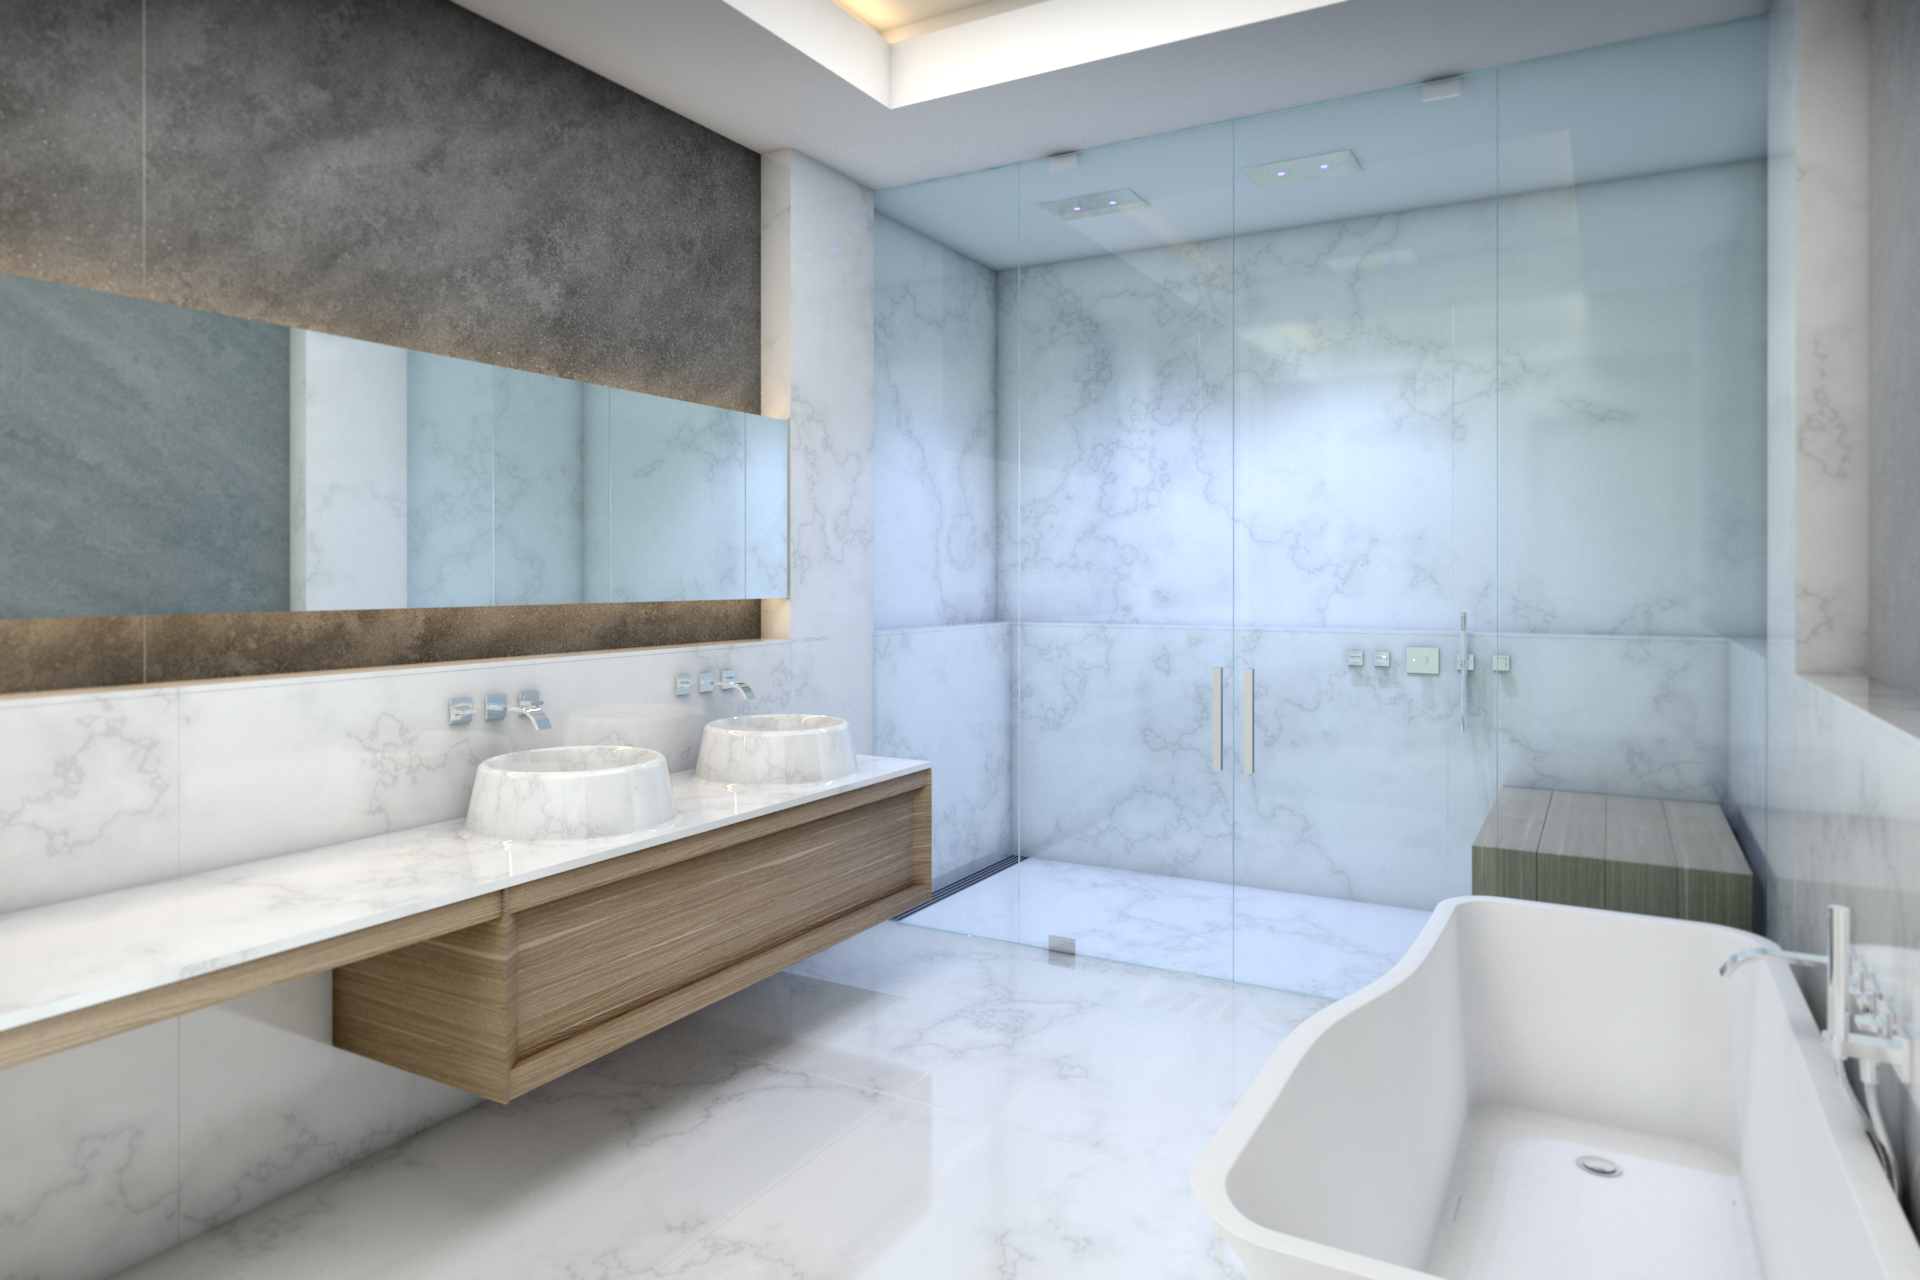 53 greene PH Master Bathroom B opt2 07.jpg